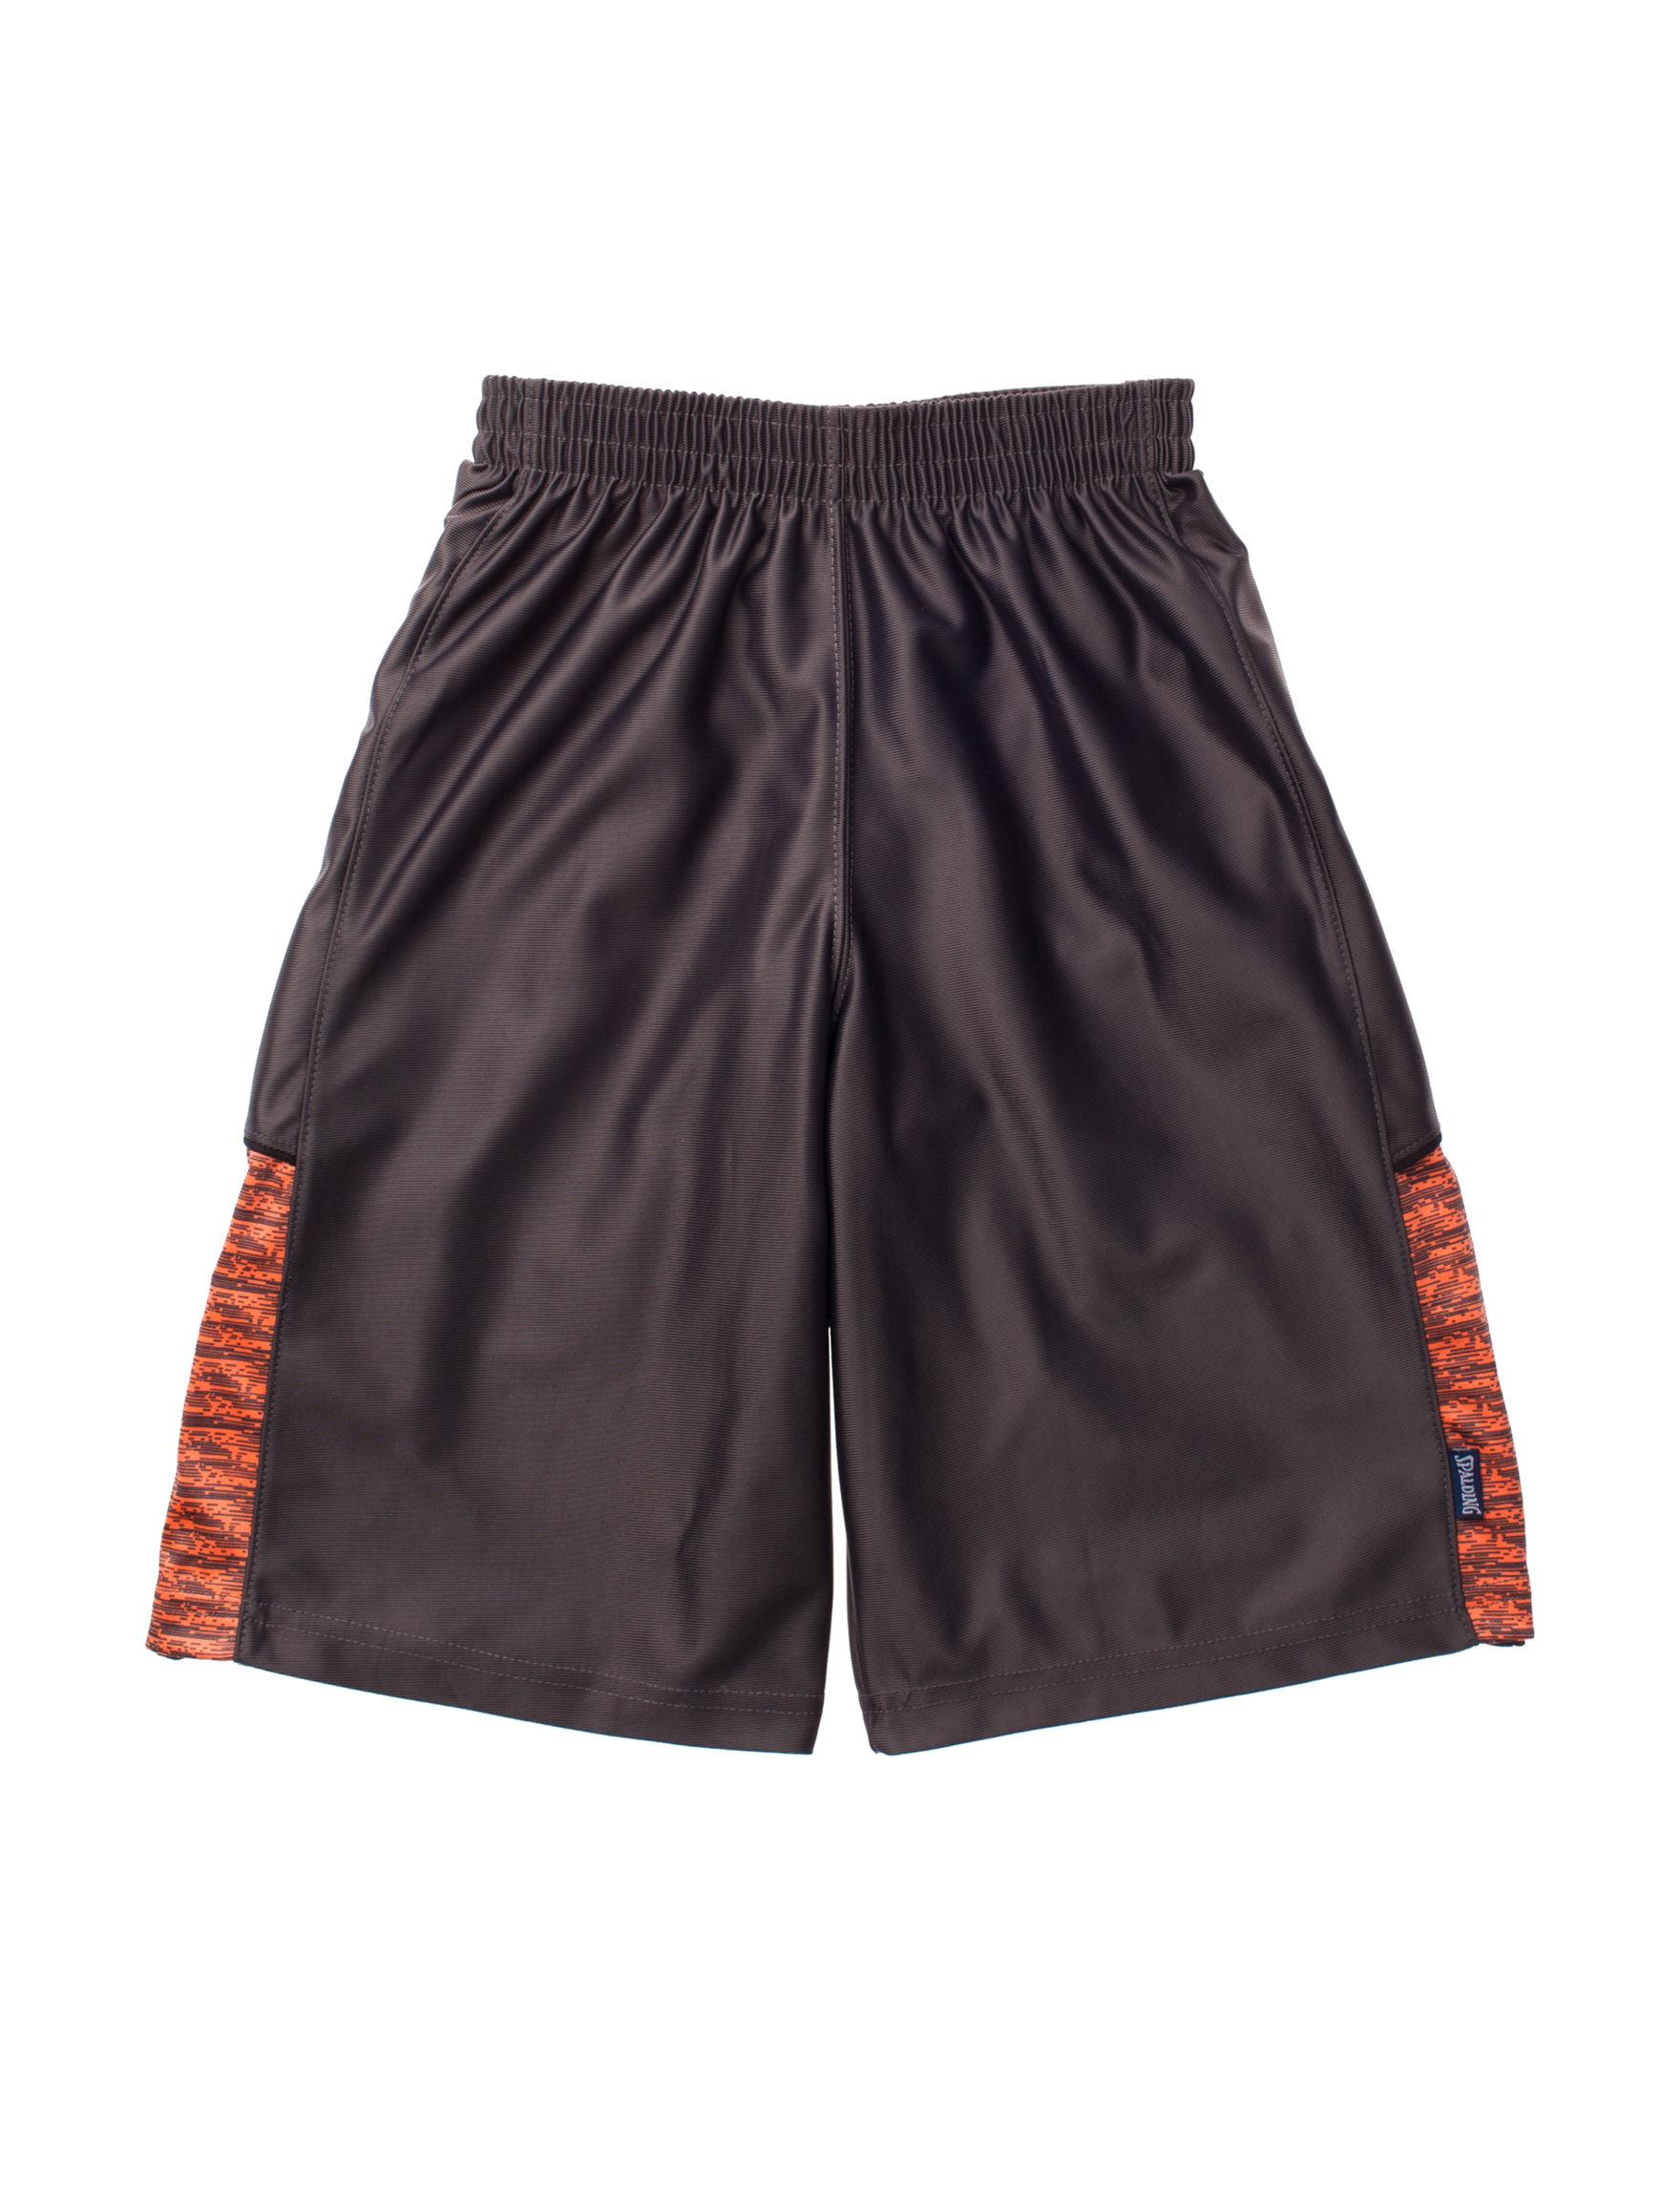 Spalding Grey Soft Shorts